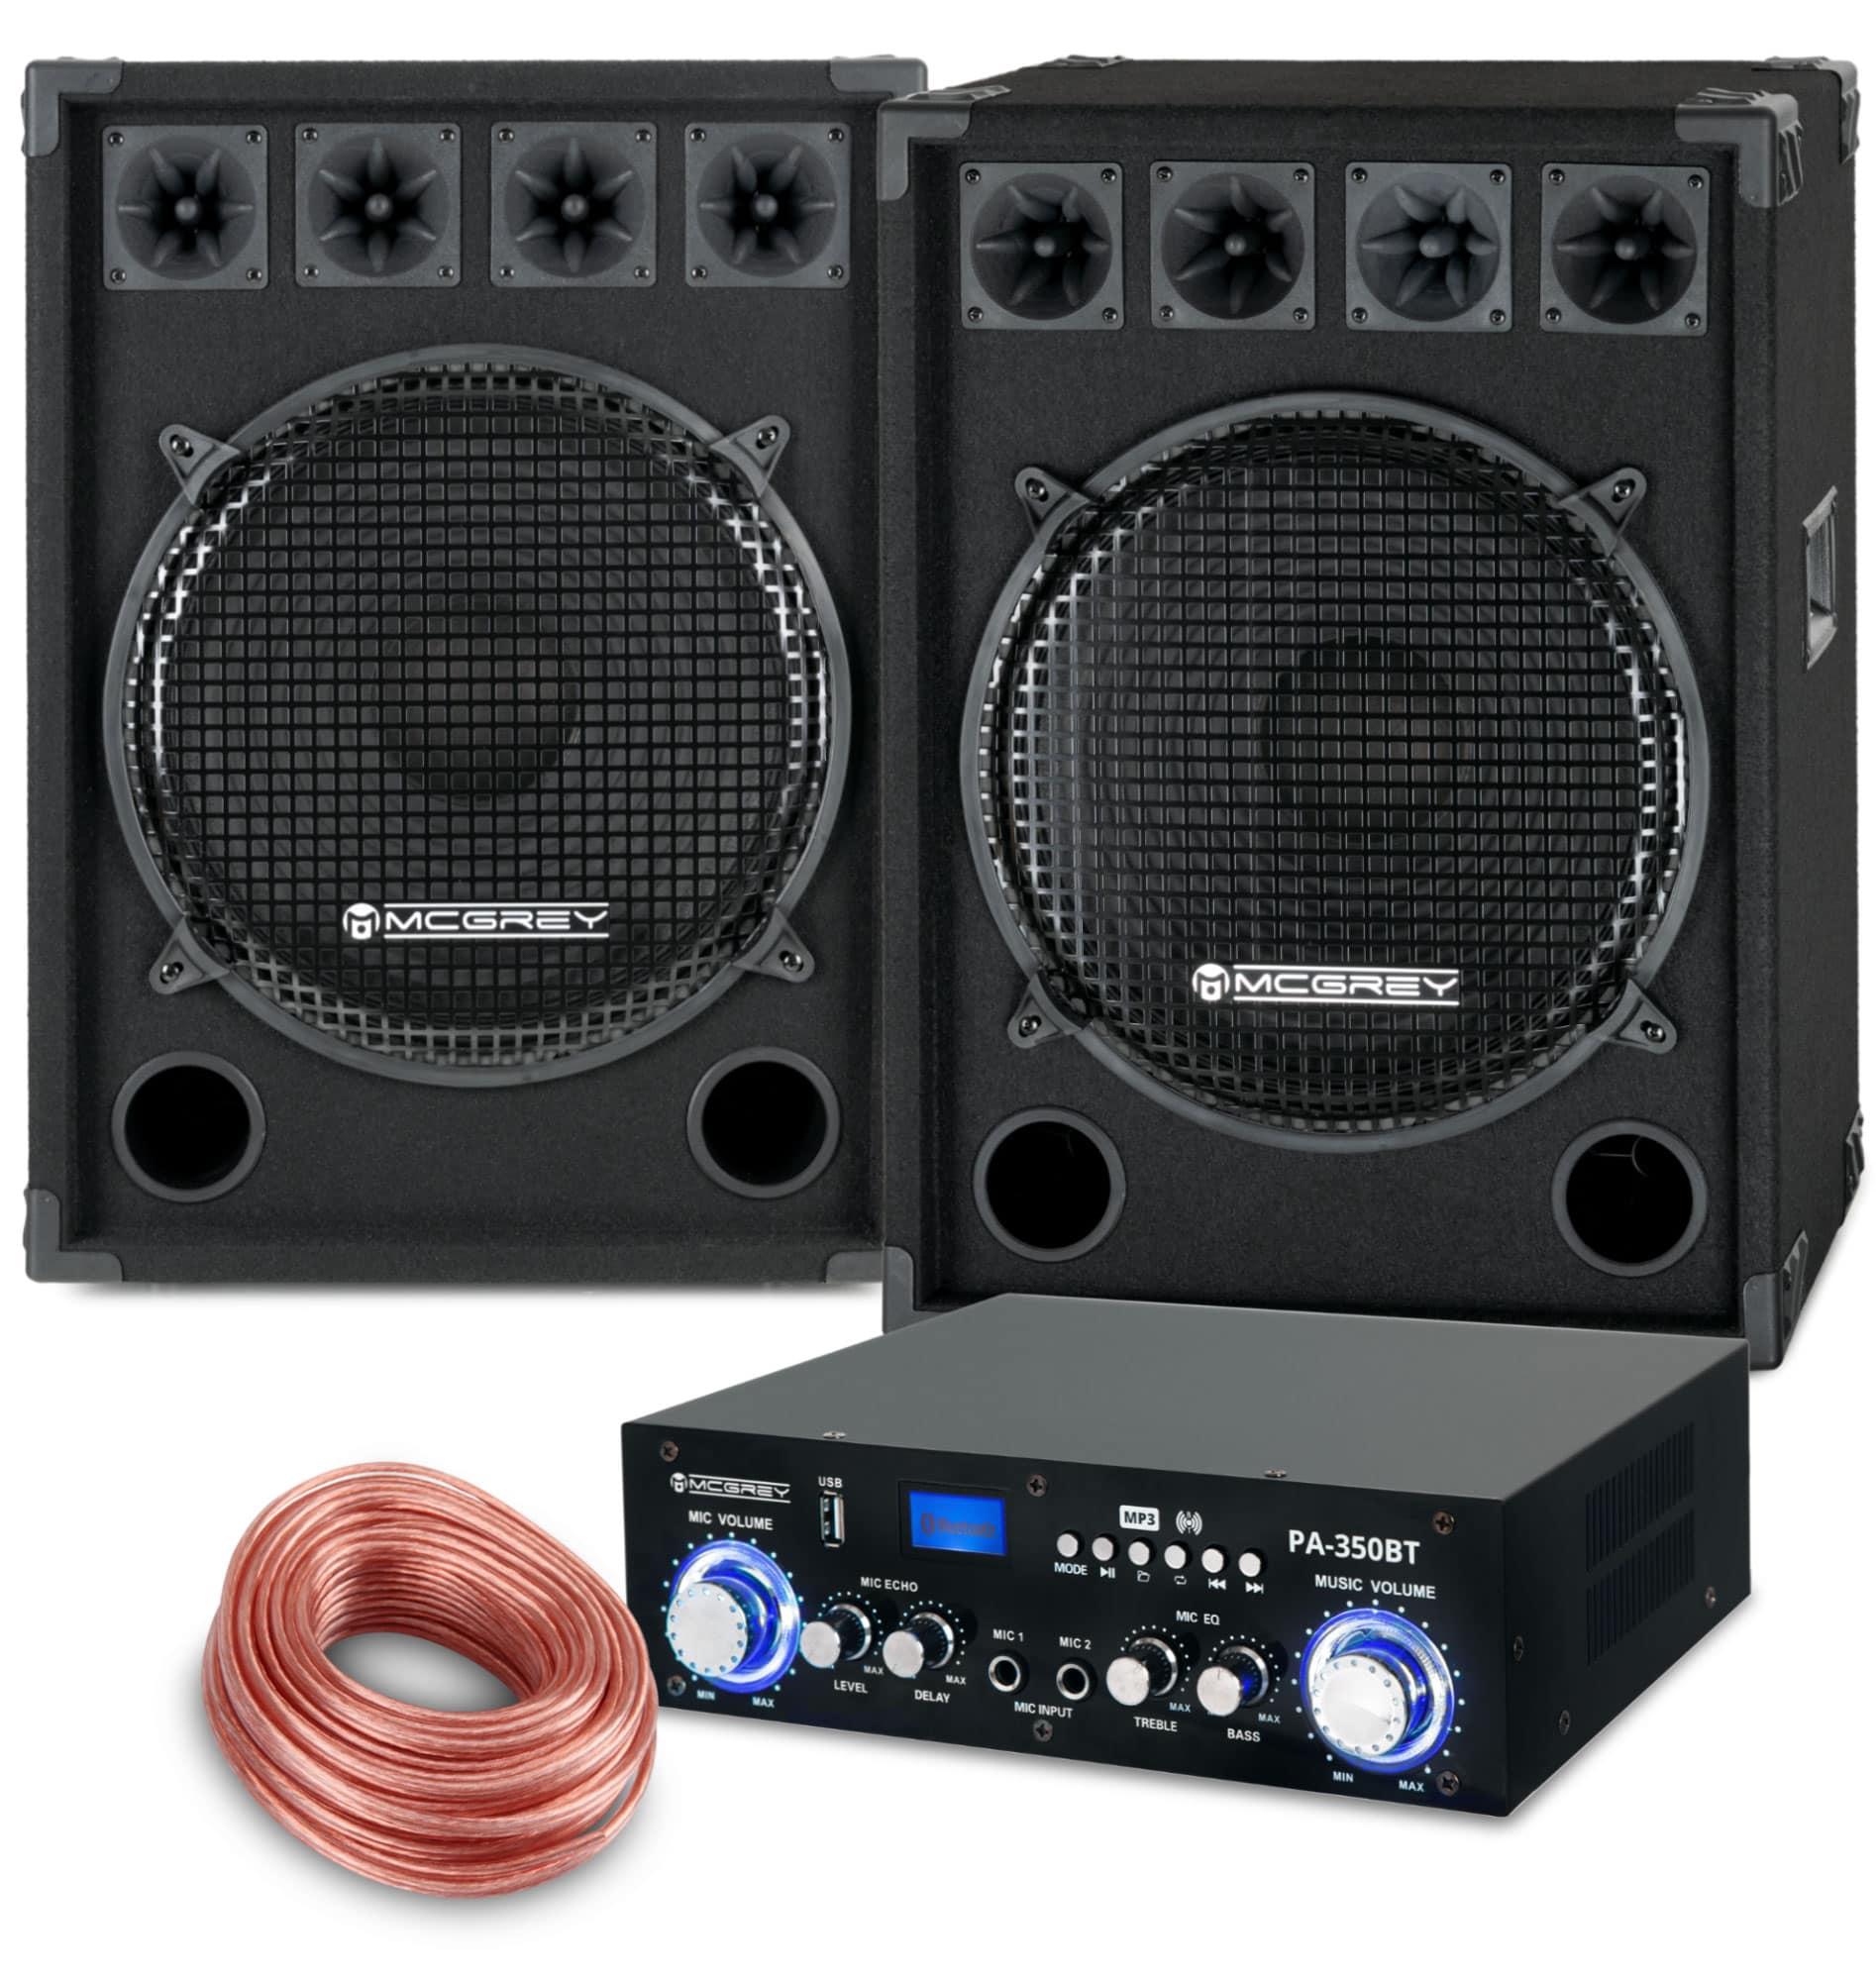 McGrey PA Komplettset PowerDJ 2500 1600W